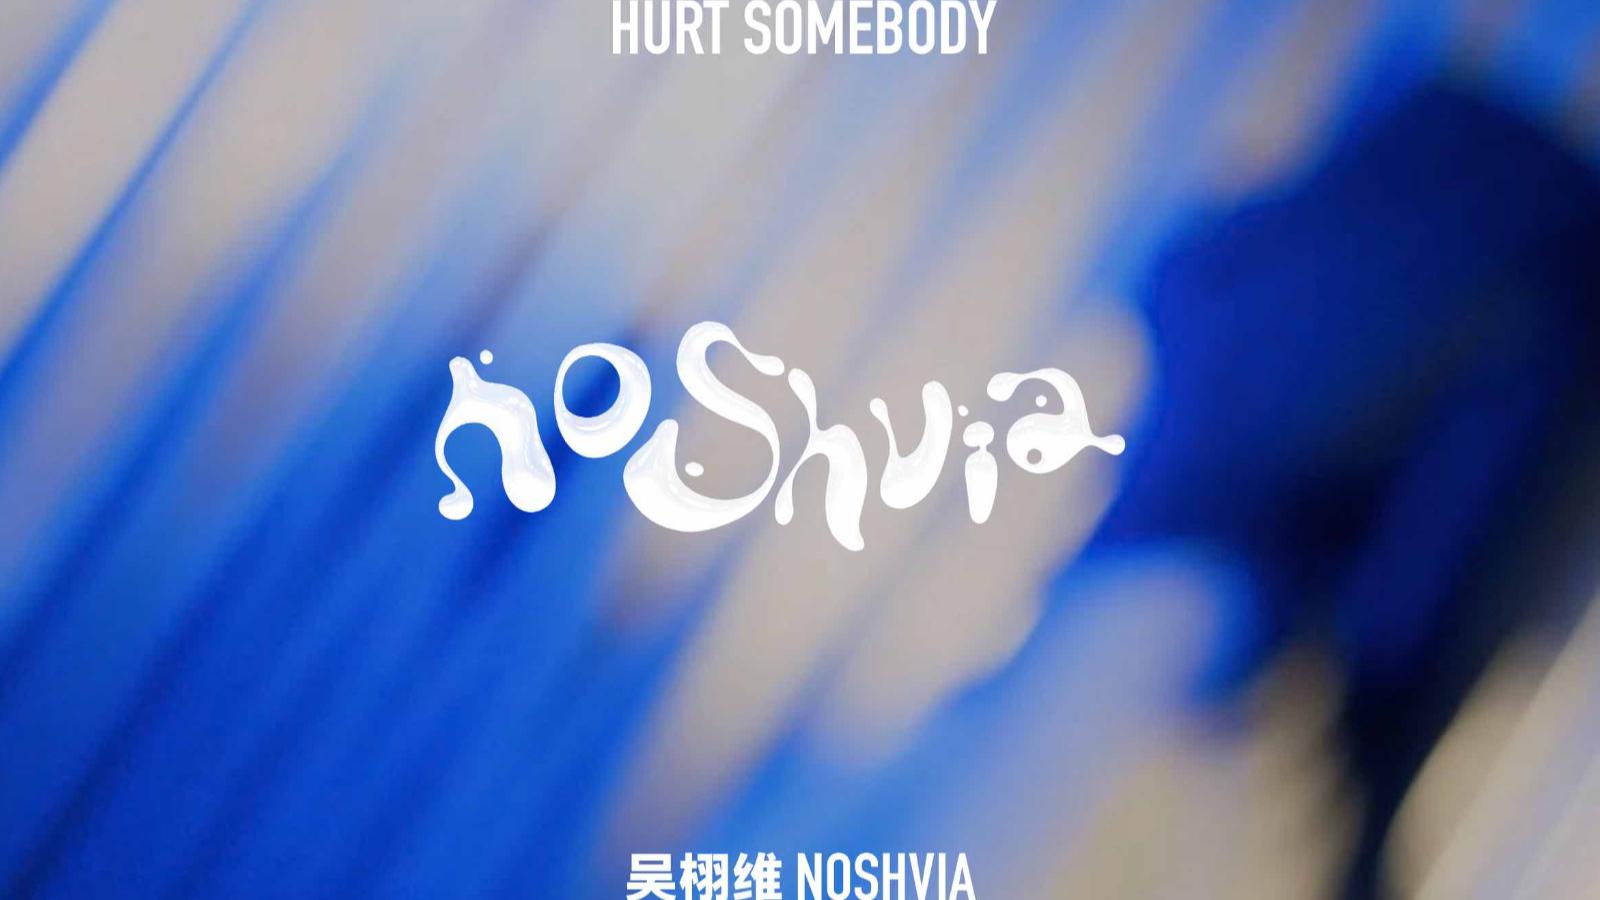 吴栩维Noshvia单曲《Hurt Somebody》 官方MV